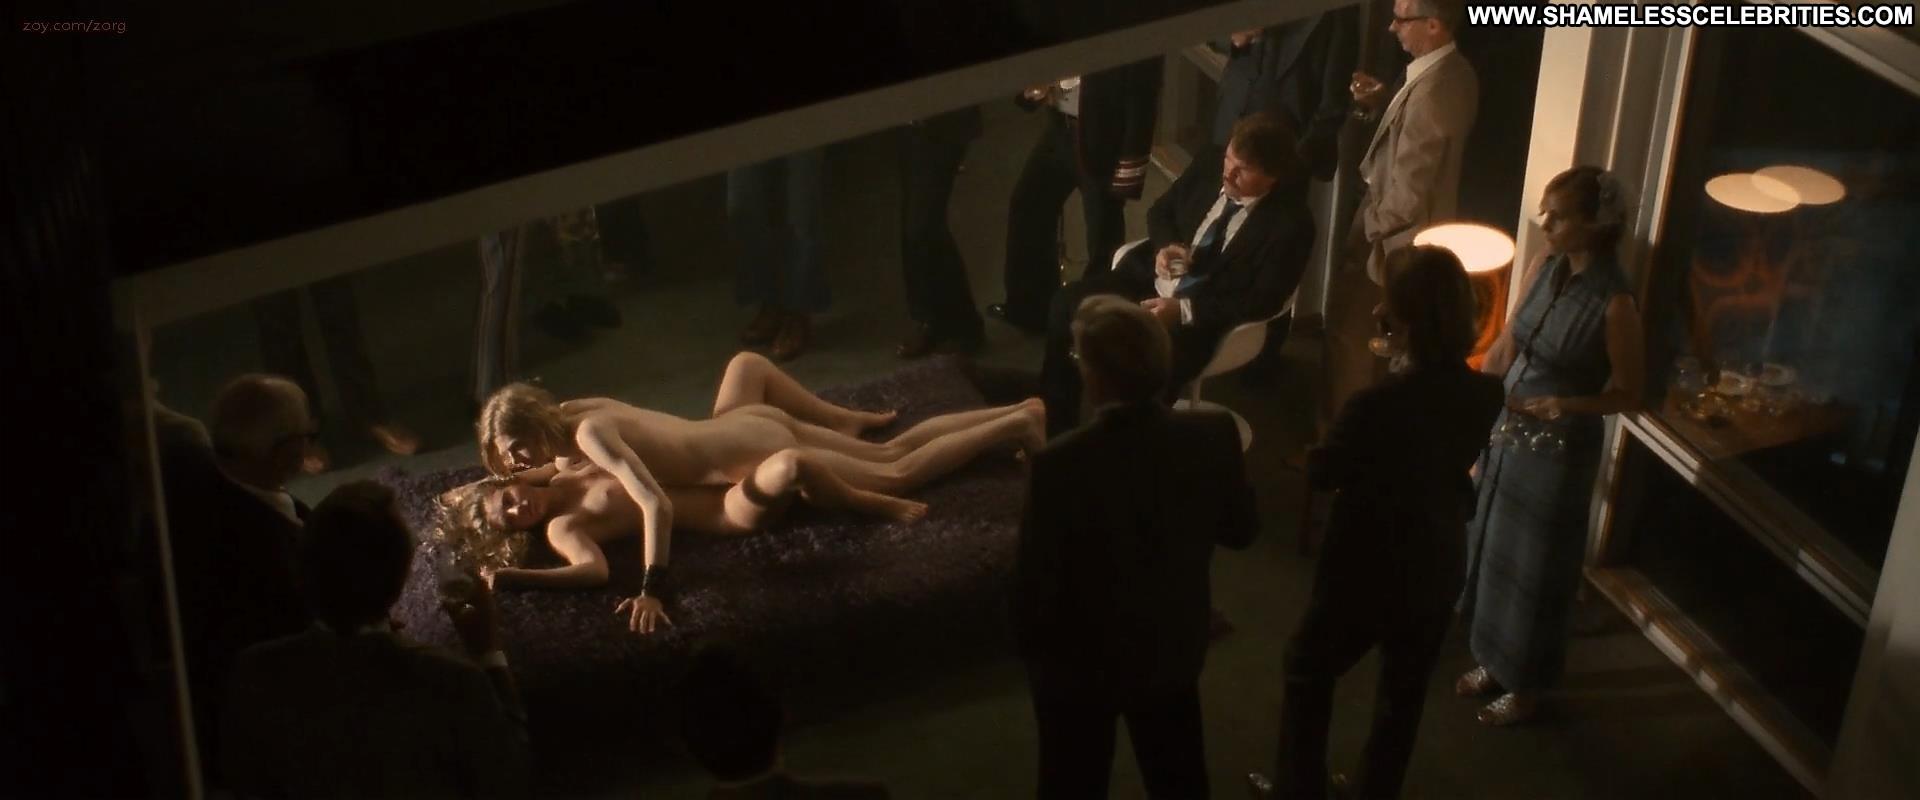 debra ling nude pics